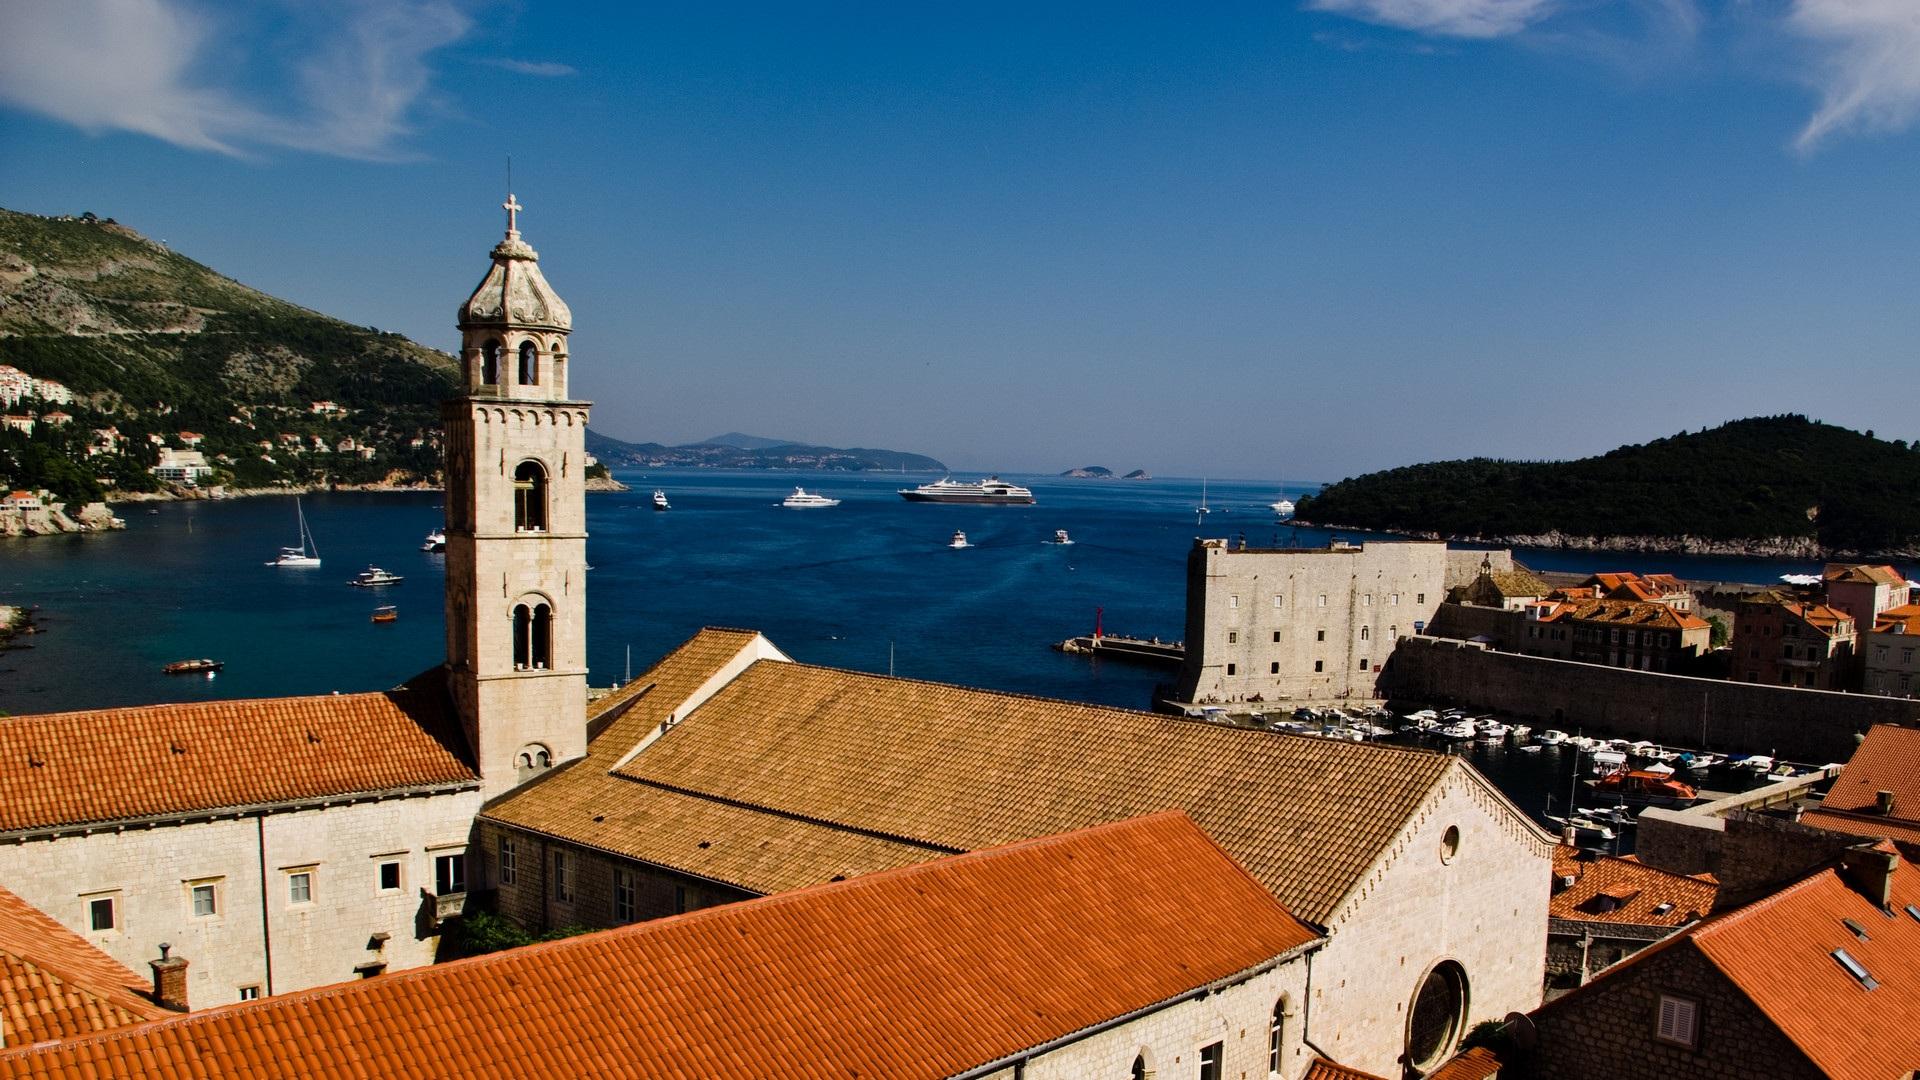 Обои Dubrovnik, здания, остров, дома, croatia, хорватия, адриатическое море, adriatic sea. Города foto 13